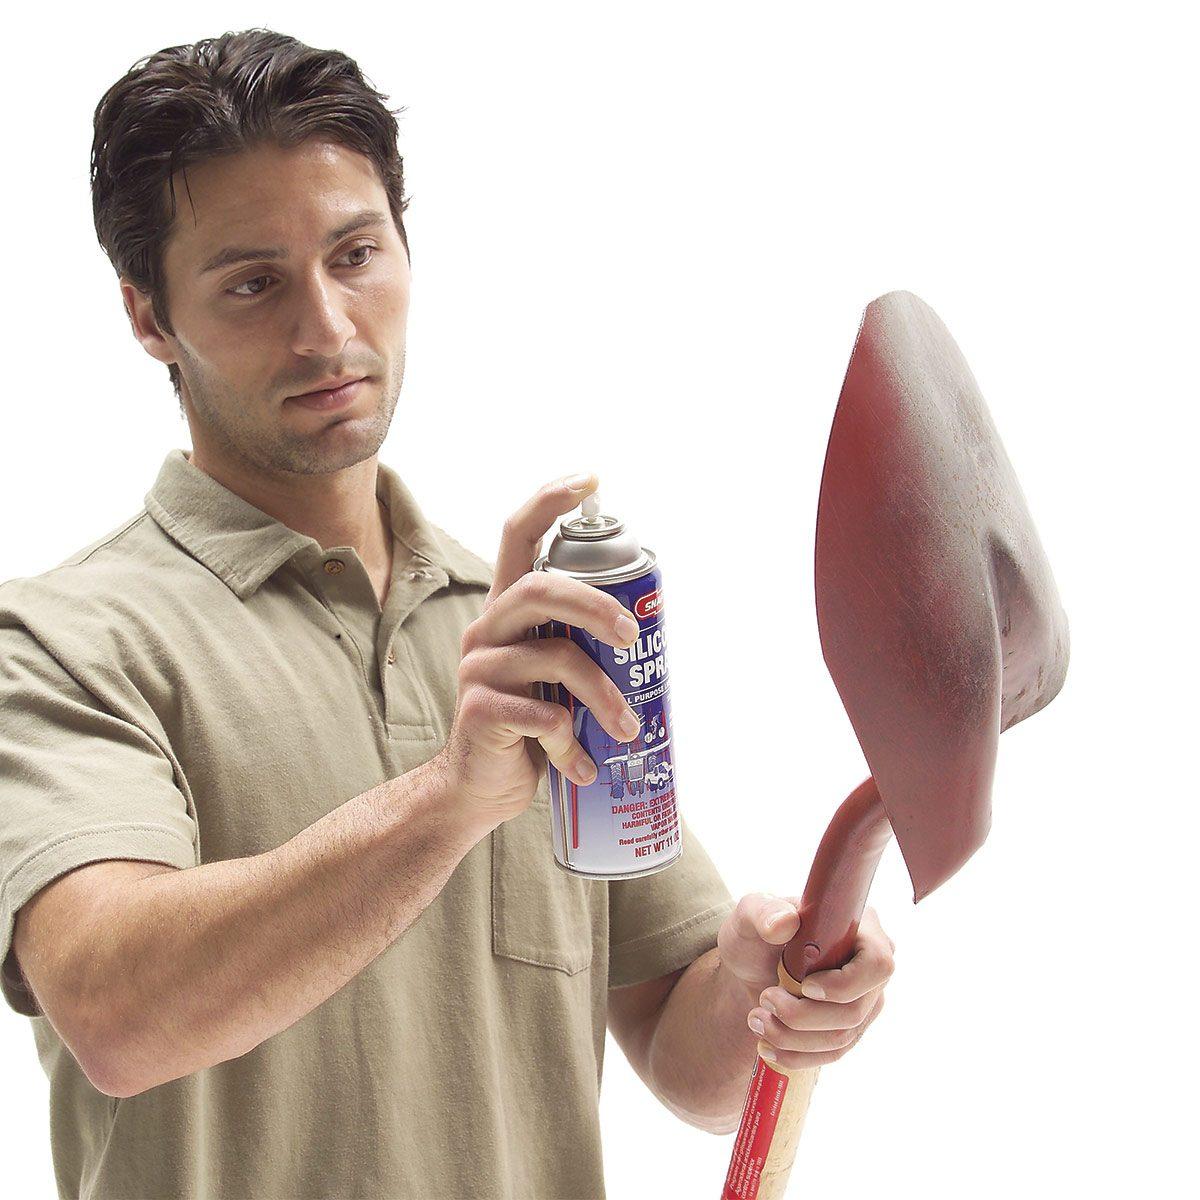 spraying shovel with pam